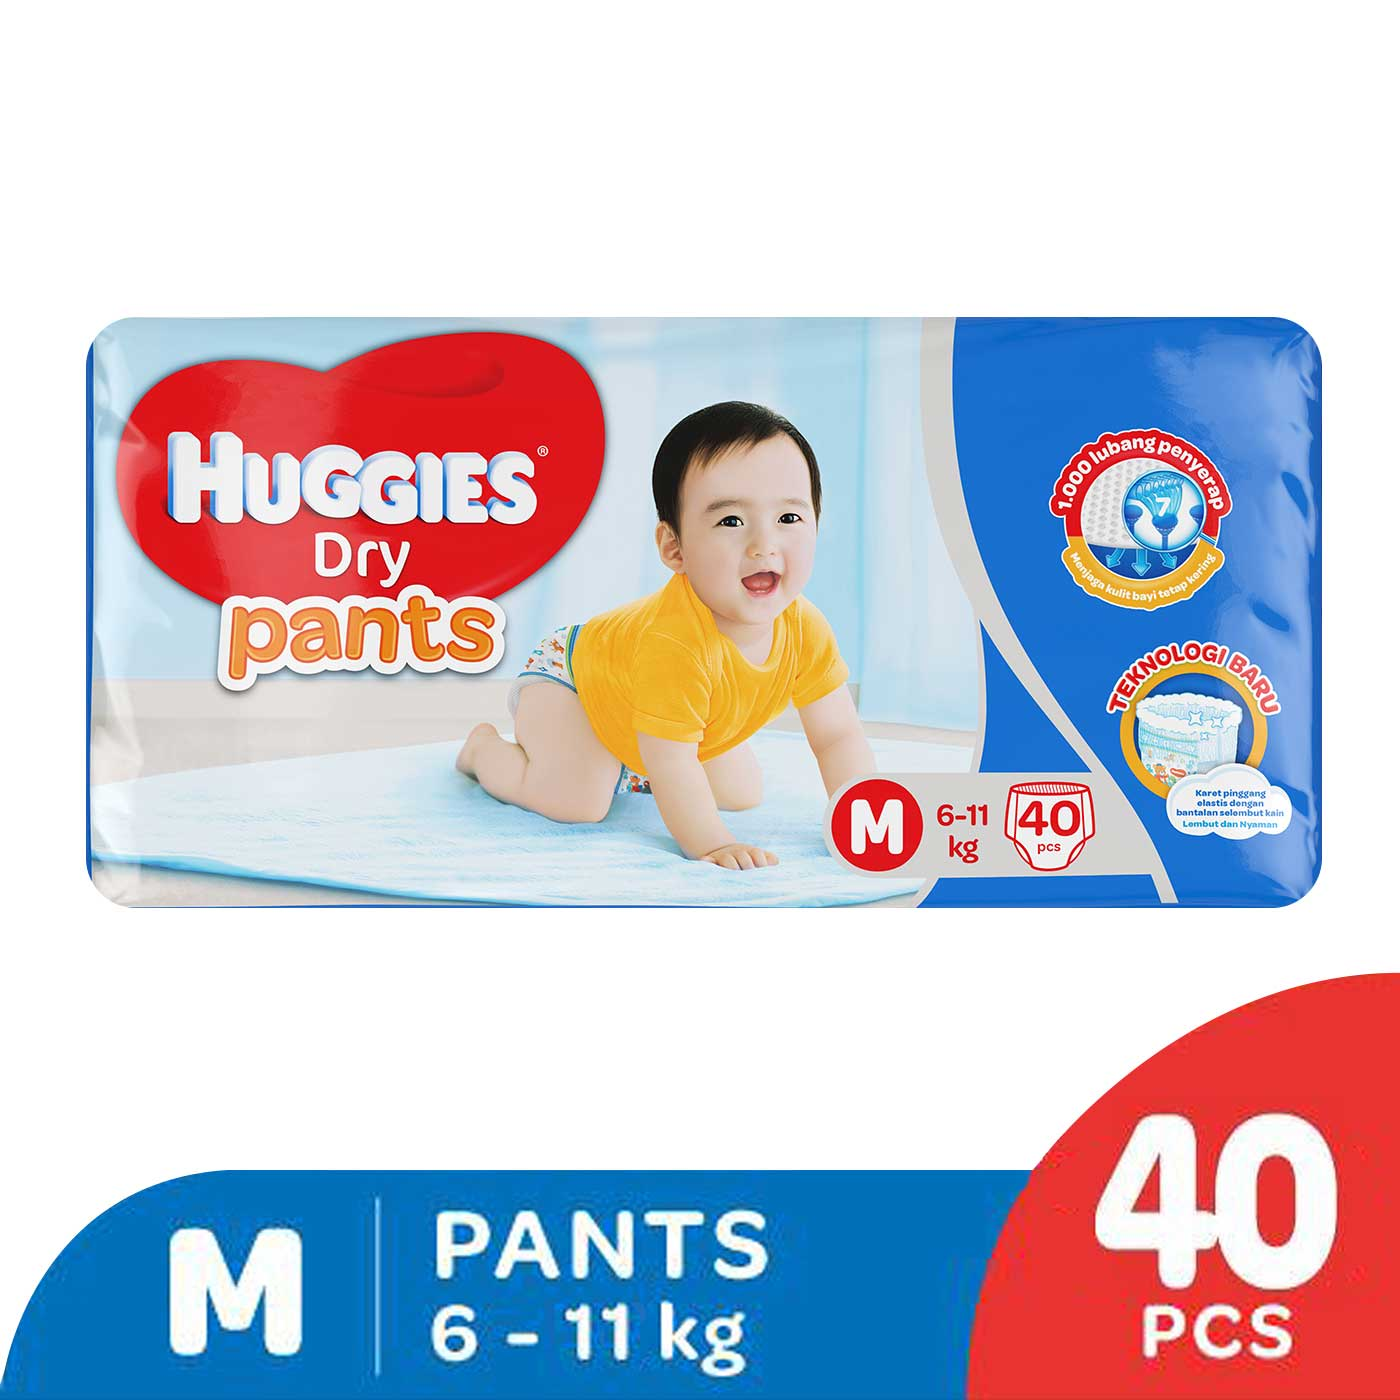 Huggies Dry Pants M 40